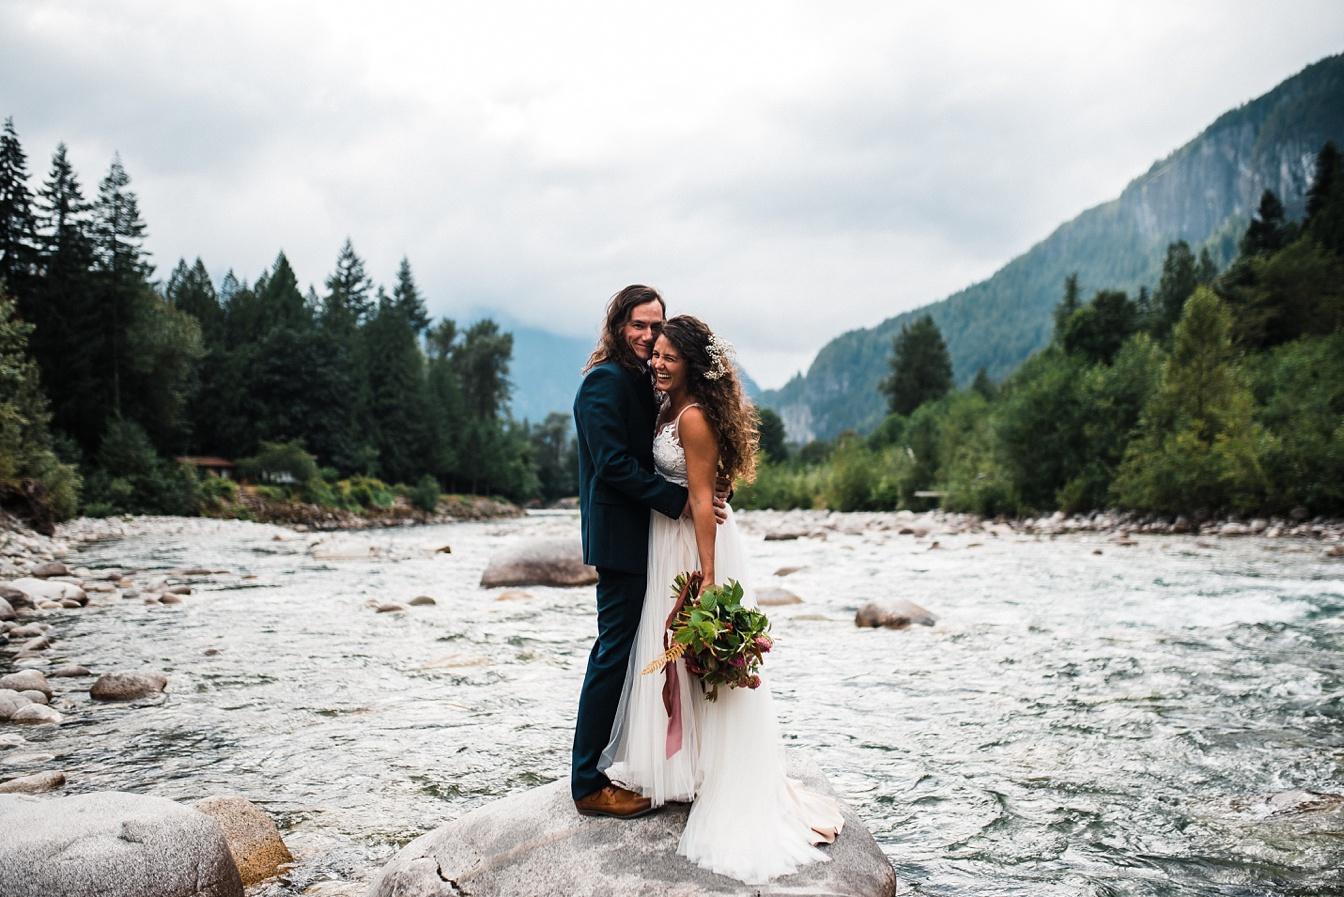 Elopement photography for adventure elopements